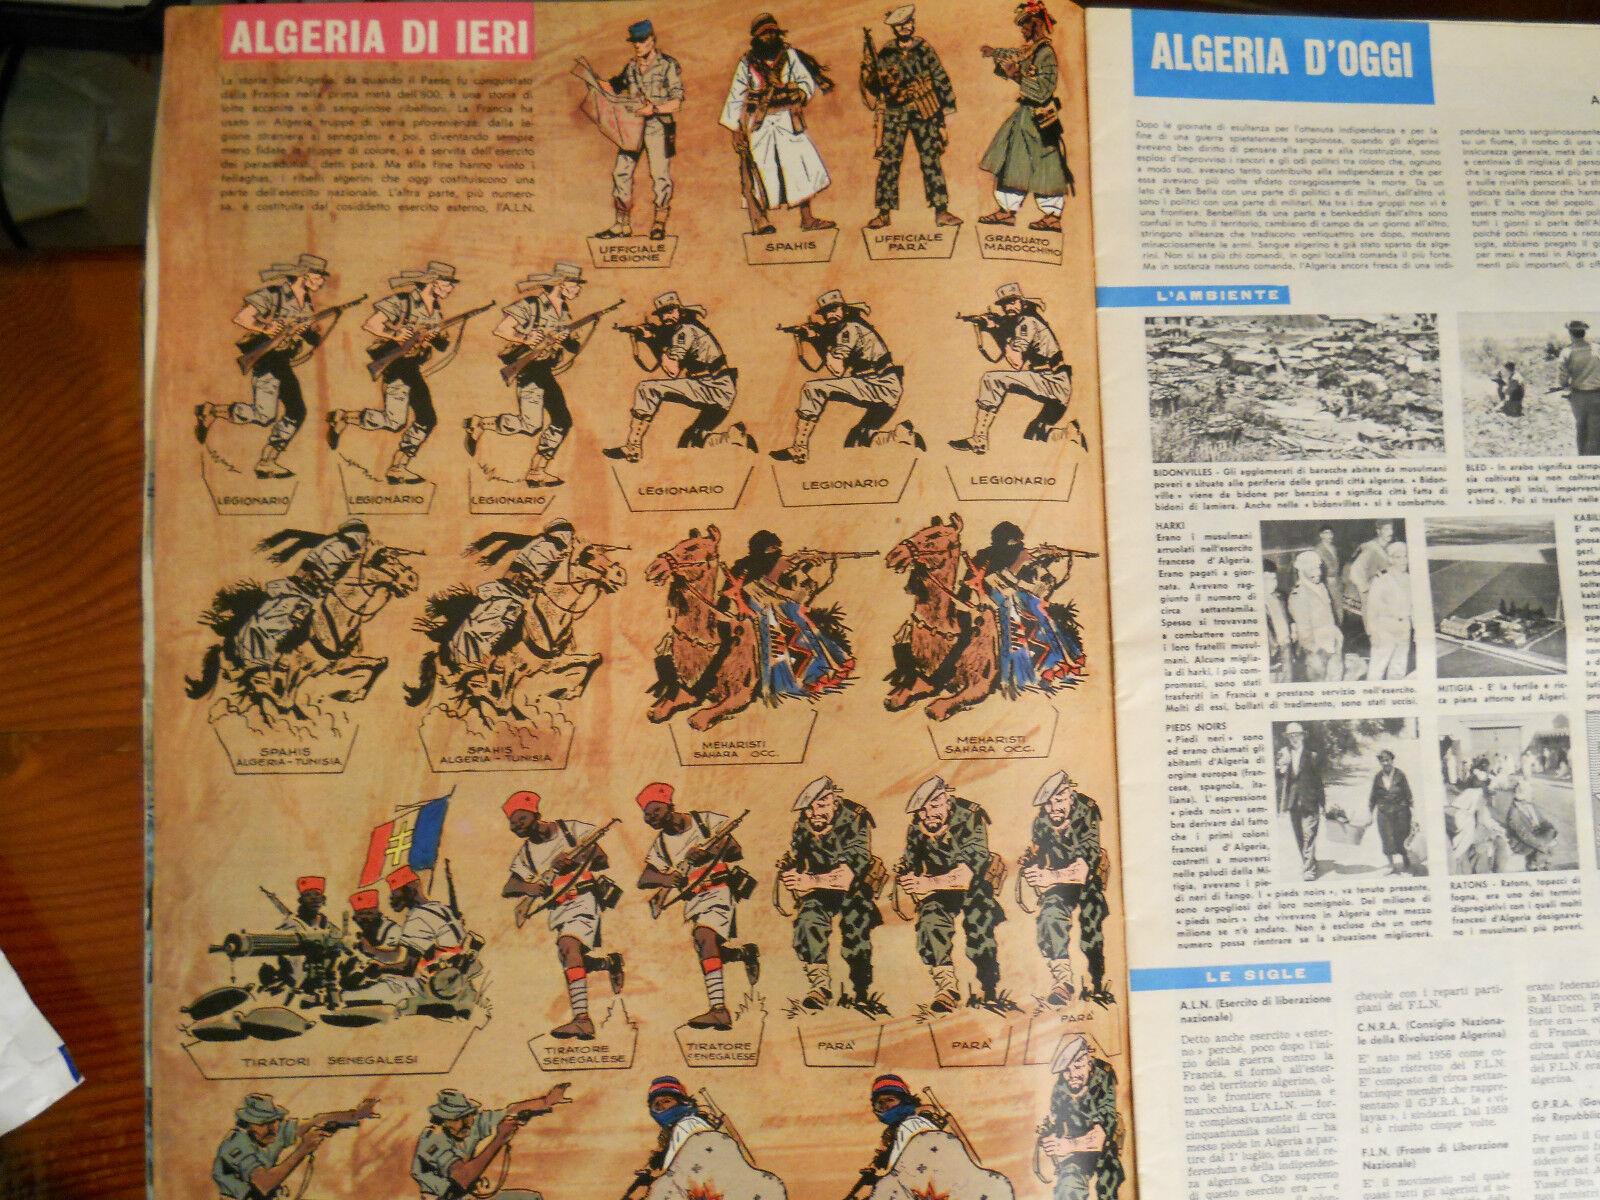 Corriere dei piccoli soldatini di HUGO PRATT Algerie lègion étrangèr ALN  '60